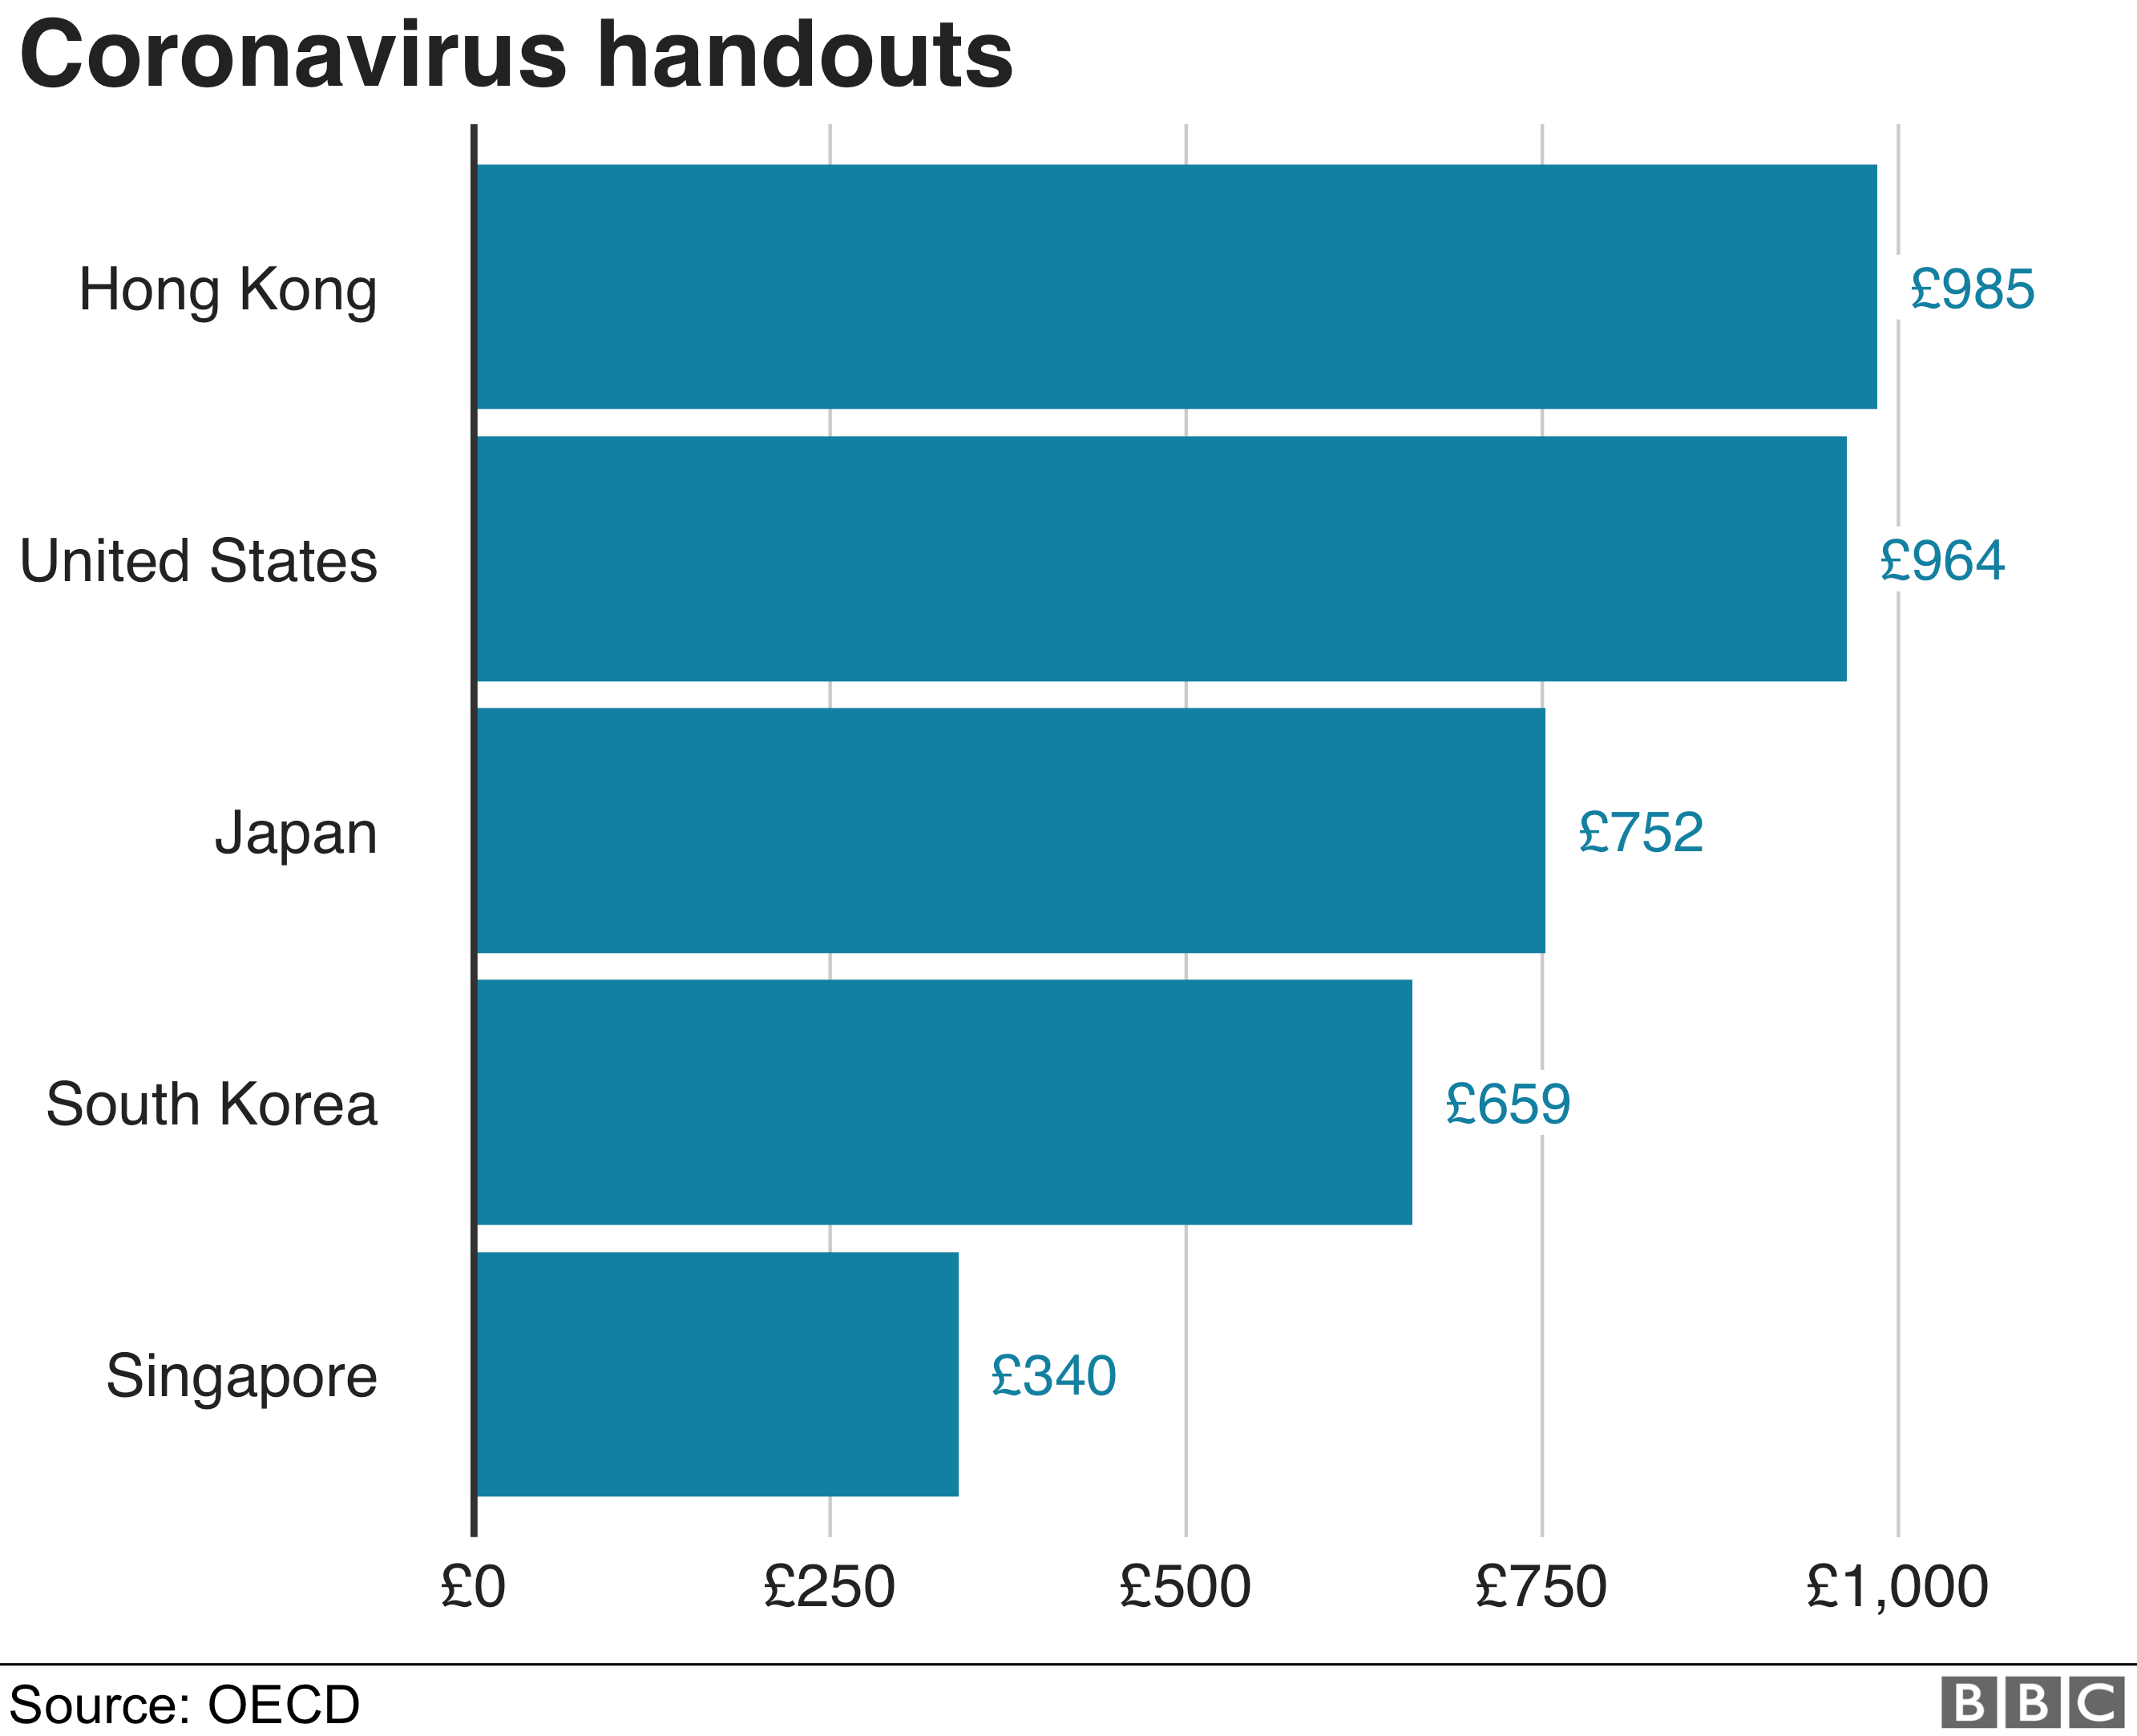 Coronavirus handouts